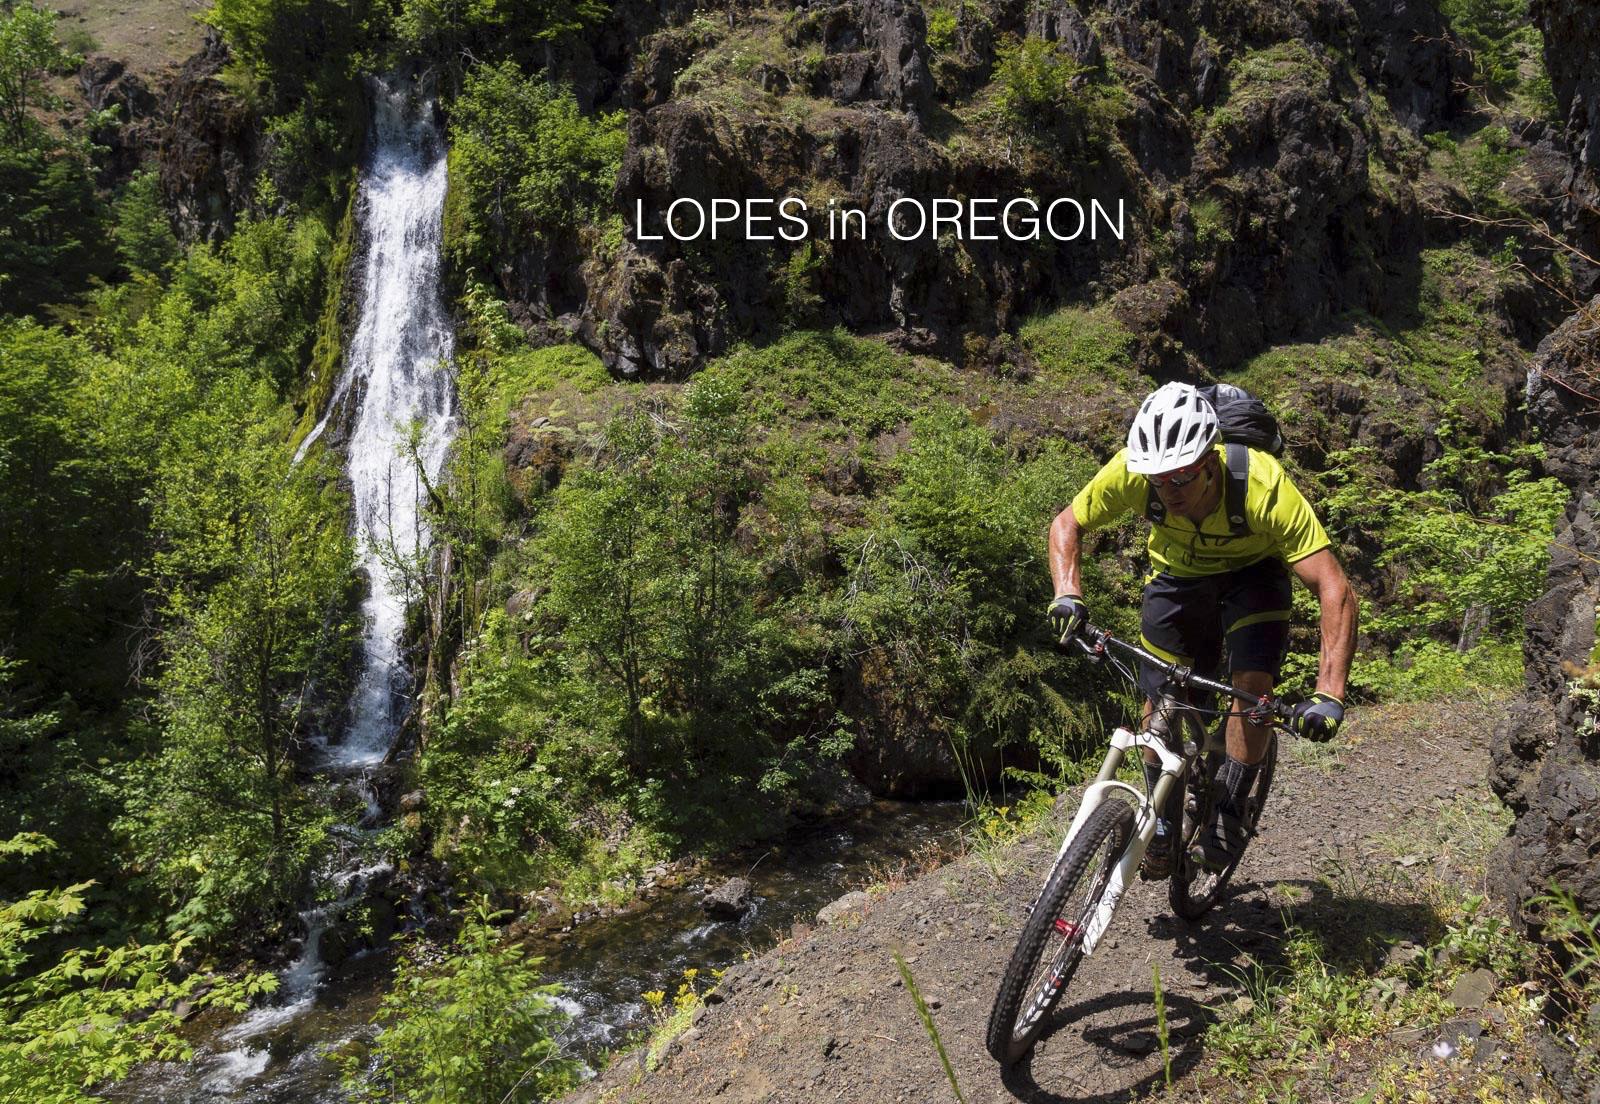 Lopes / Olympus OMD-EM5 / Trnka 2012